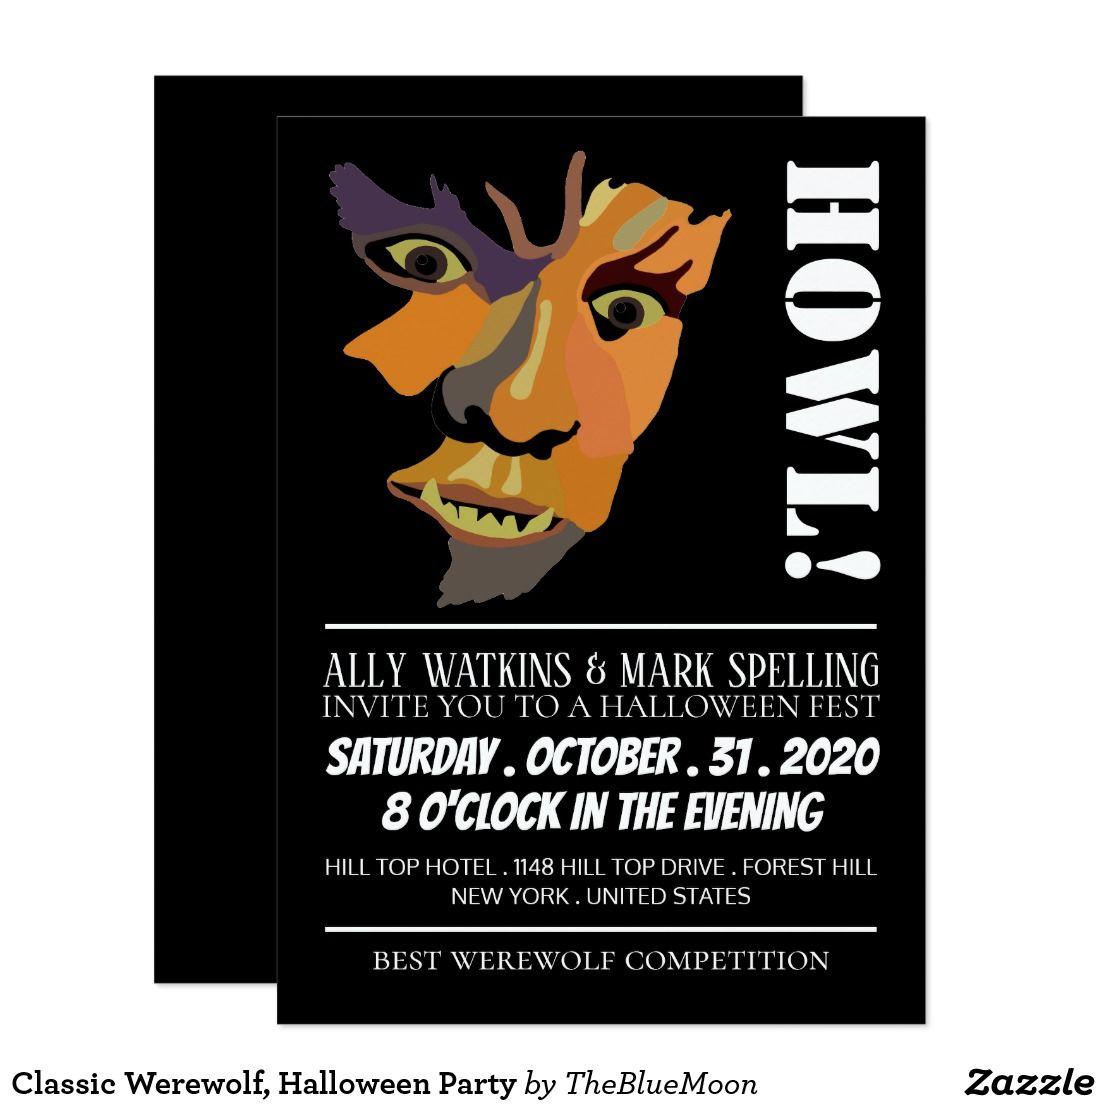 Classic Werewolf Halloween Party Invitation Zazzle Com